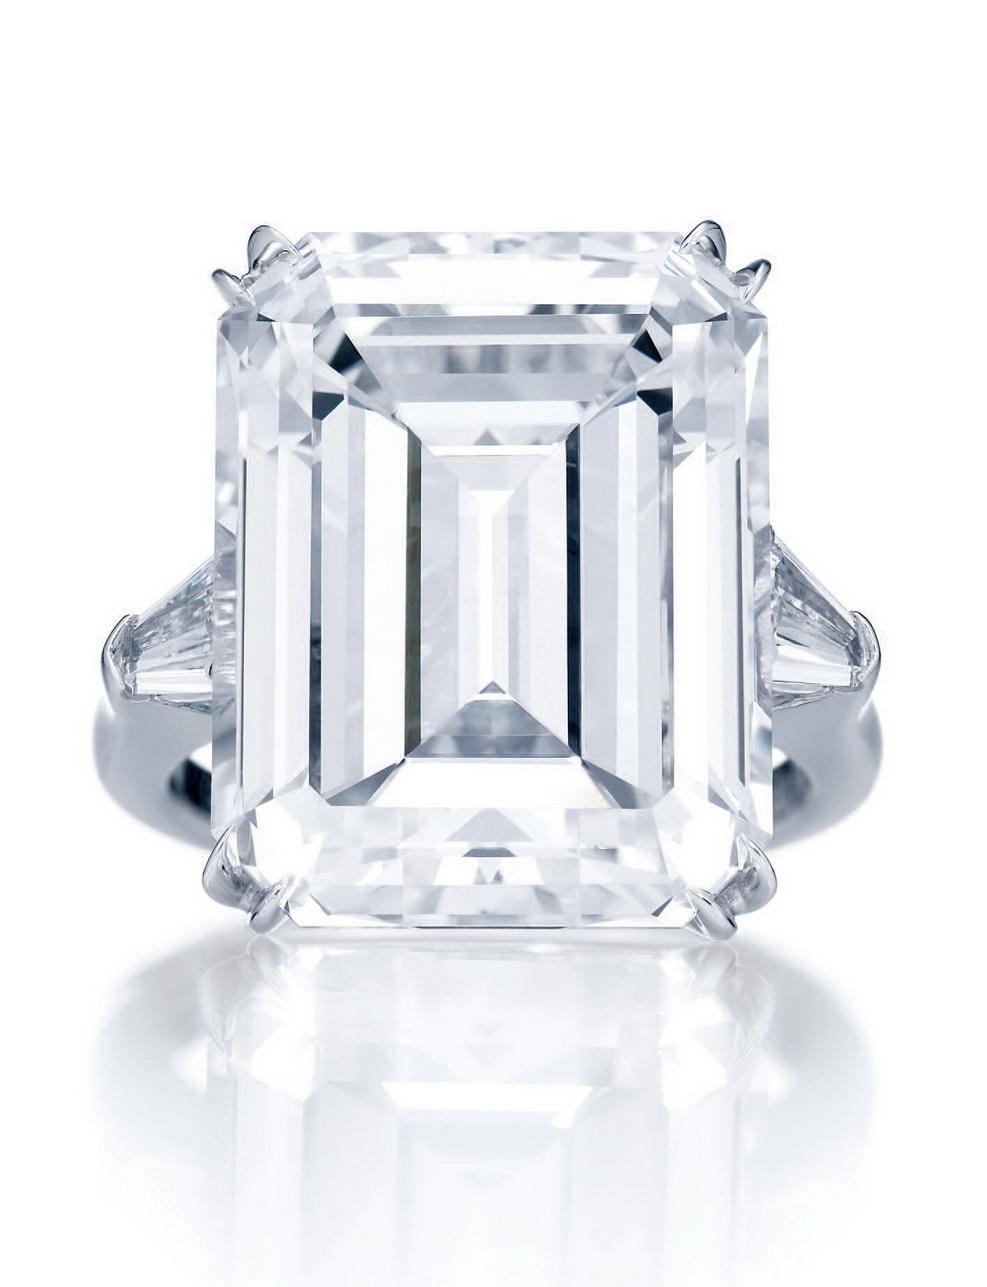 Black Diamond rings are always